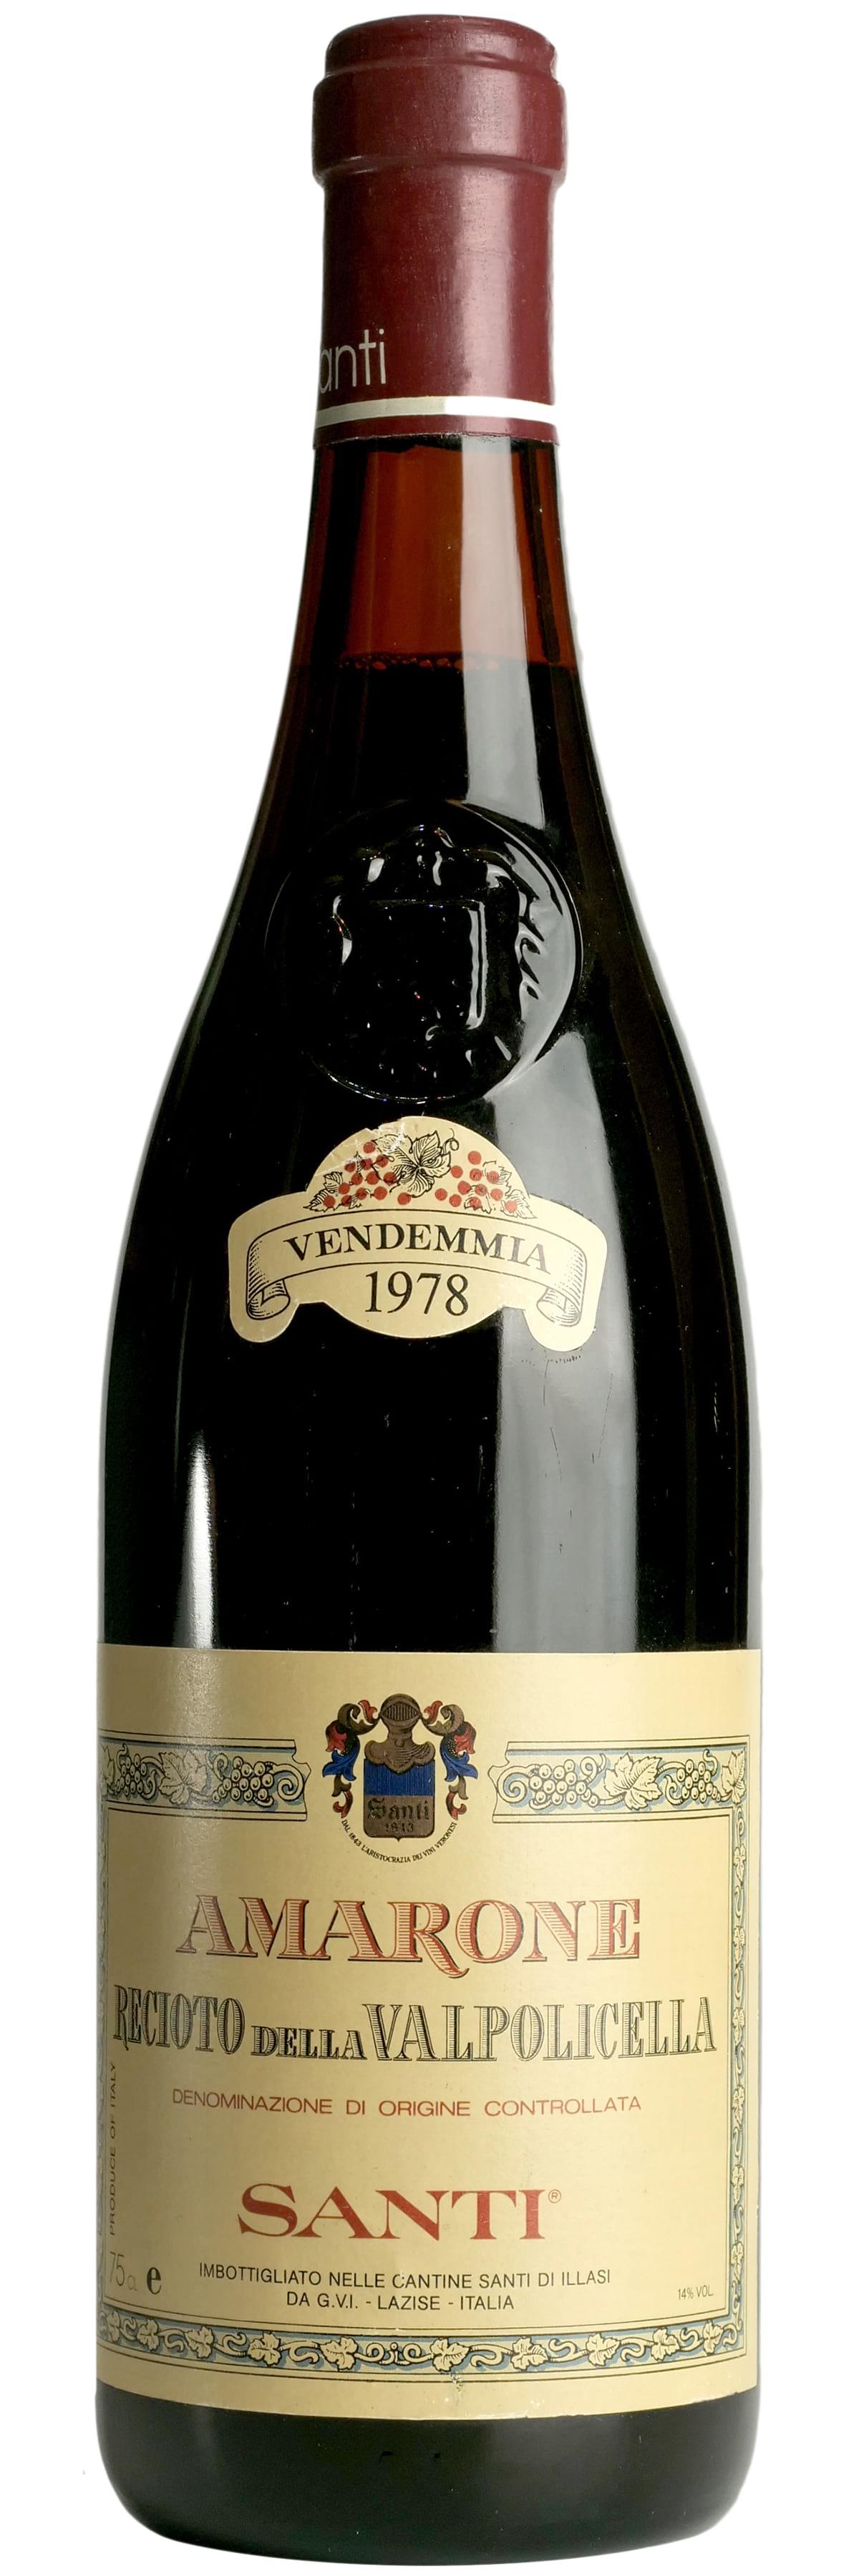 1978 Santi Amarone Recioto della Valpolicella фото